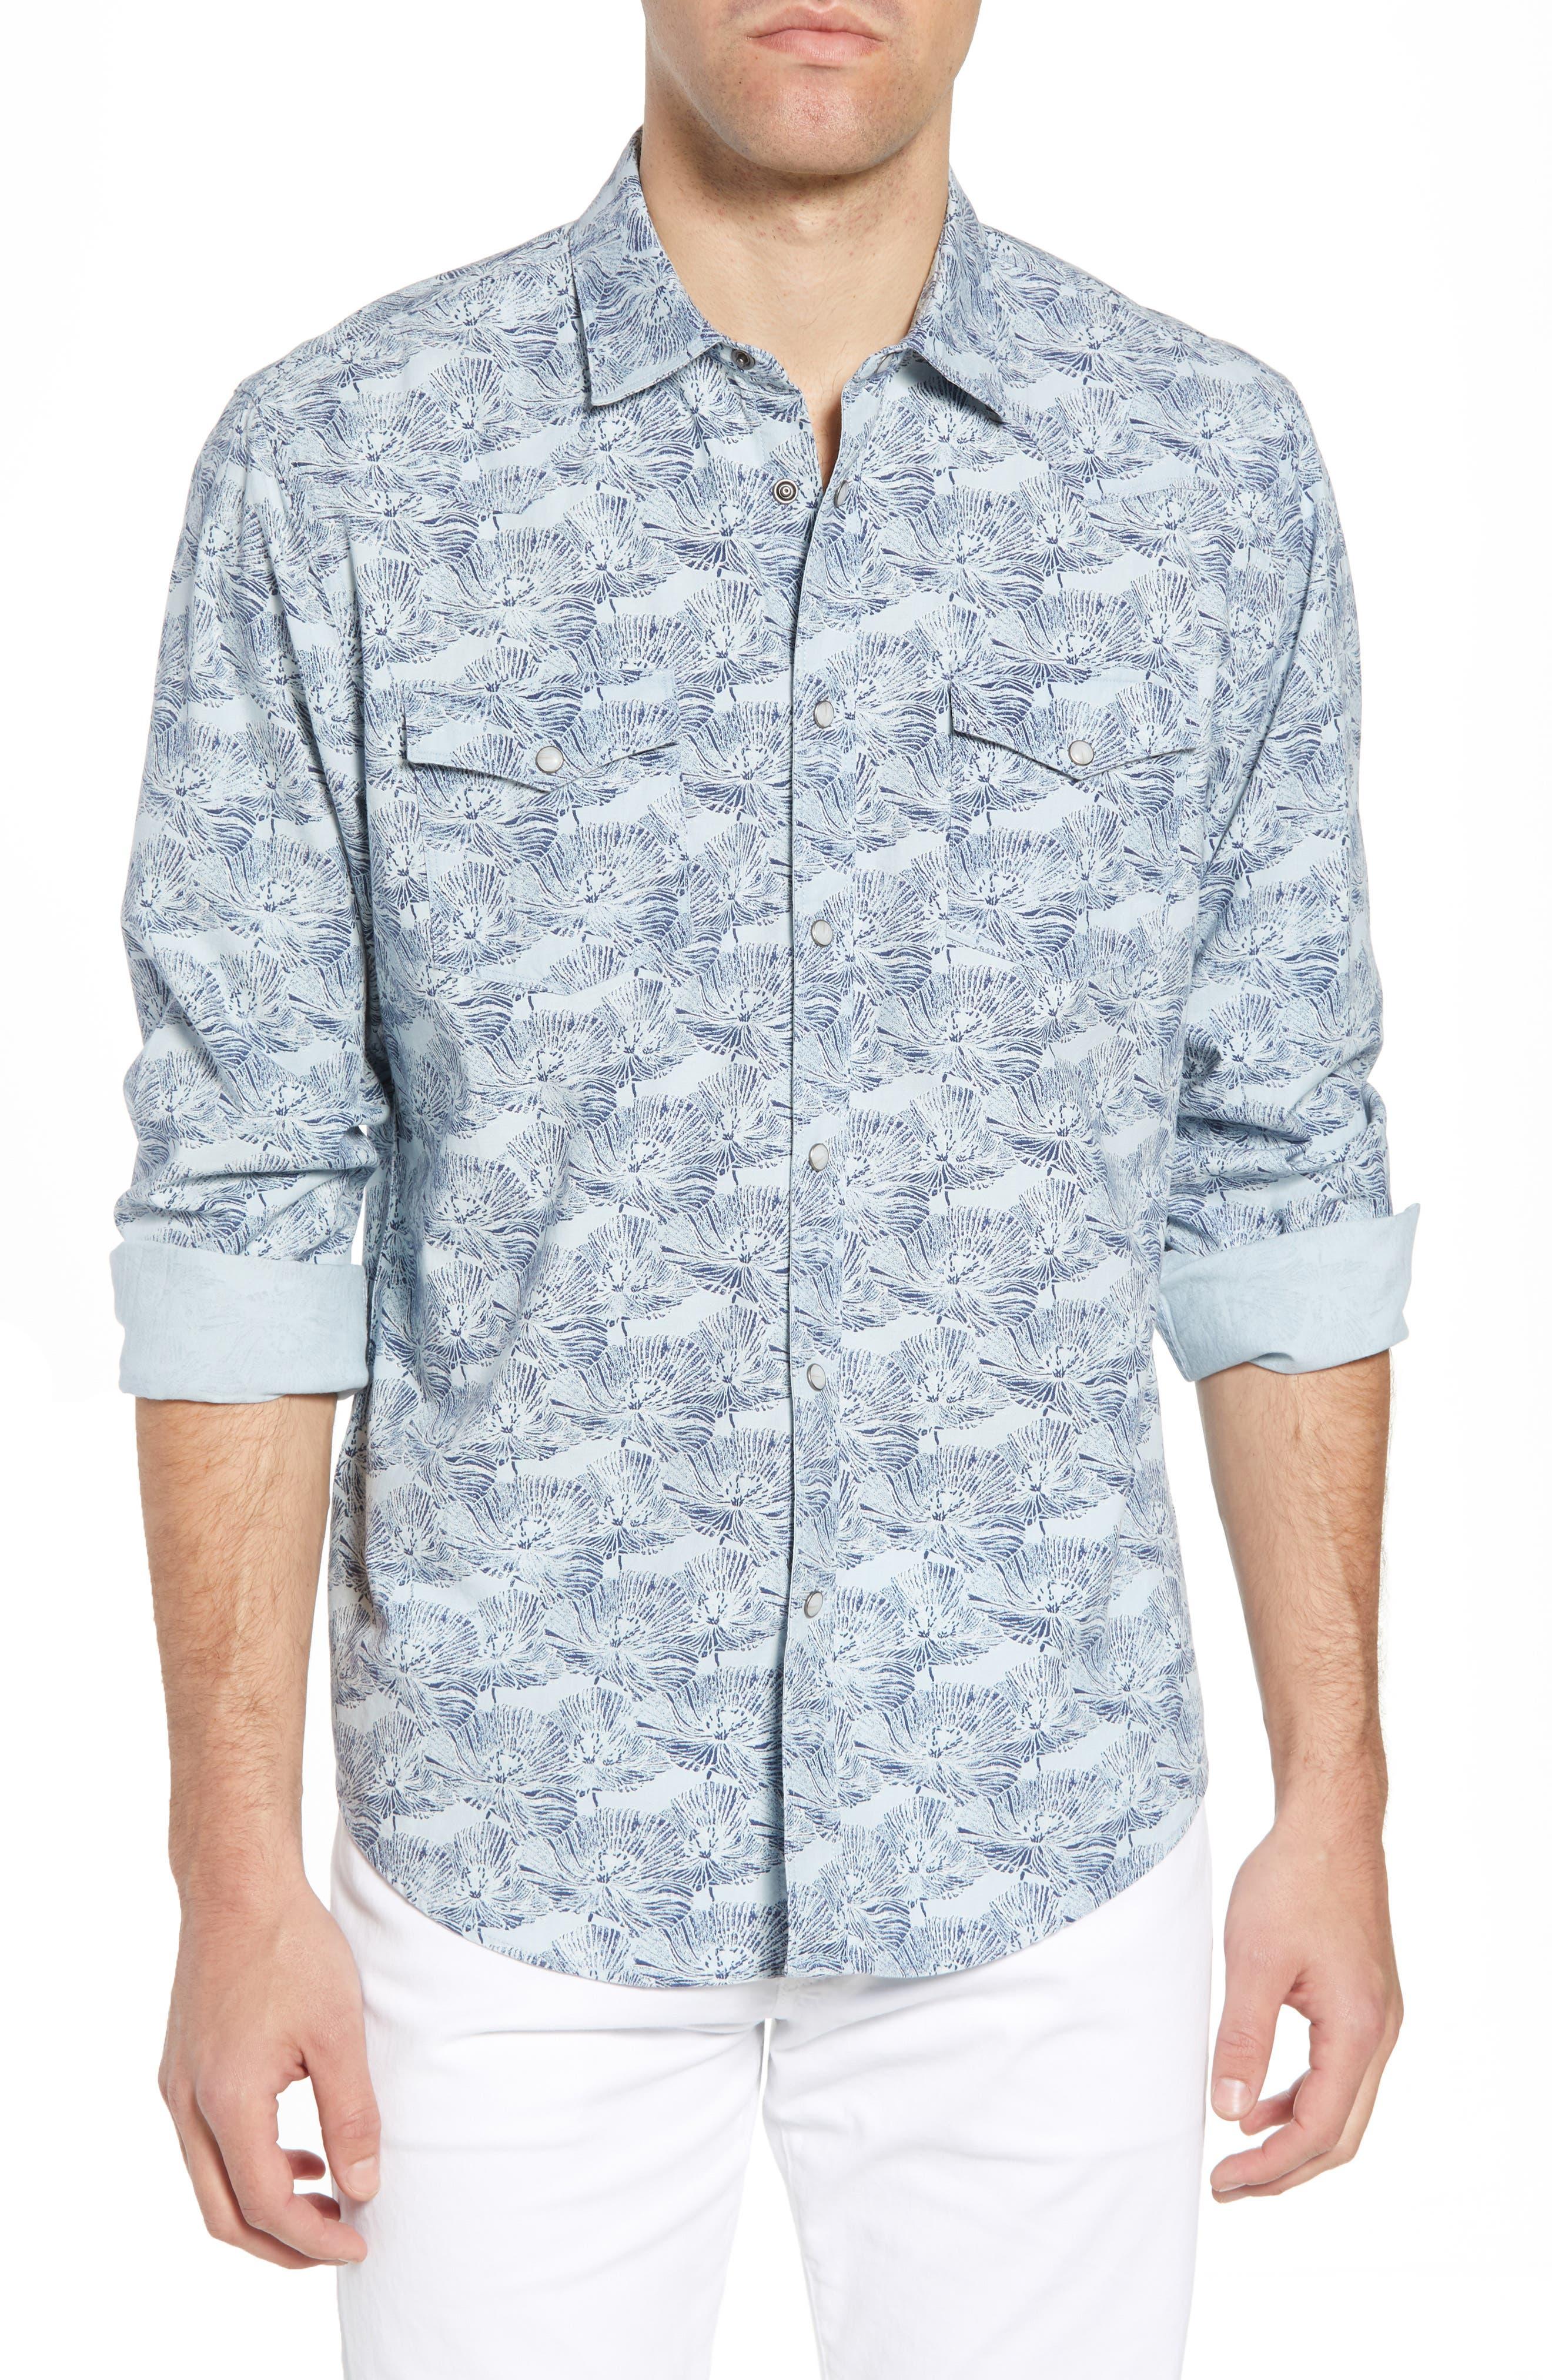 Zumas Vaquero Regular Fit Floral Sport Shirt,                         Main,                         color, Indigo